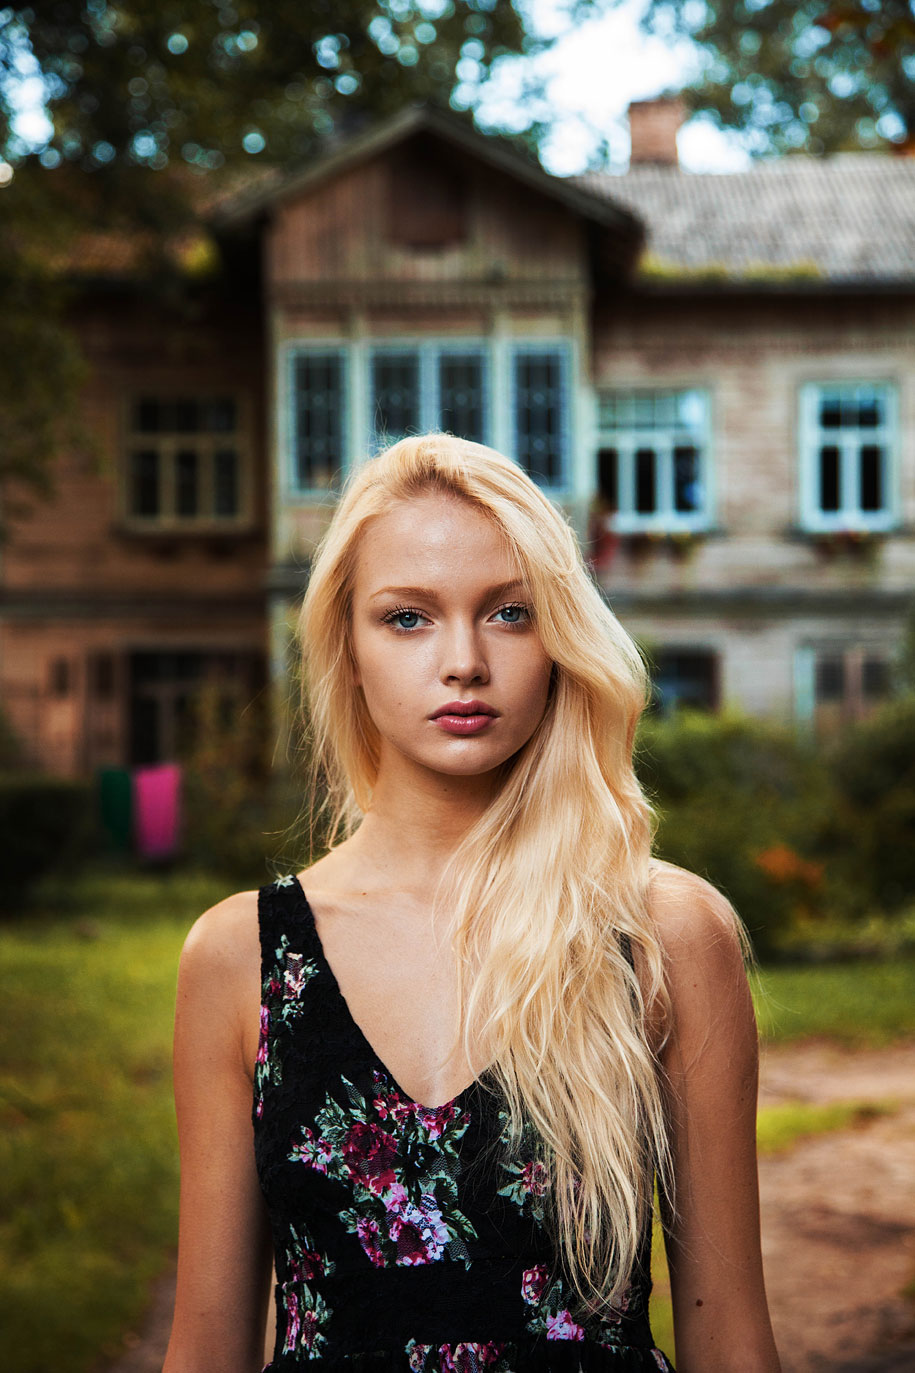 women-around-world-atlas-beauty-mihaela-noroc-8